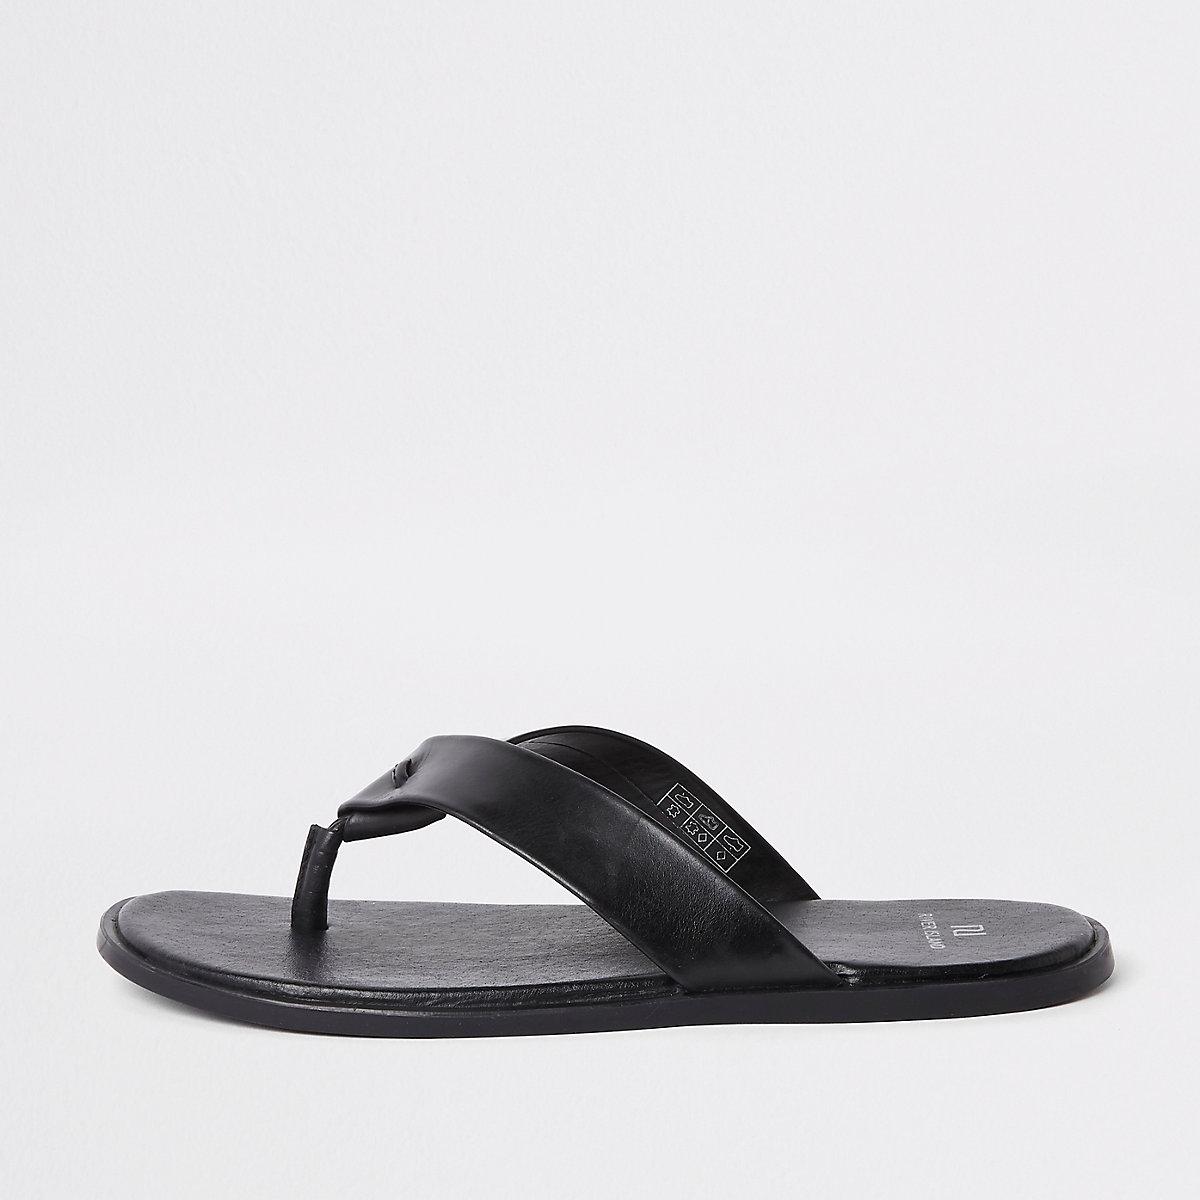 Black leather flip flop sandals